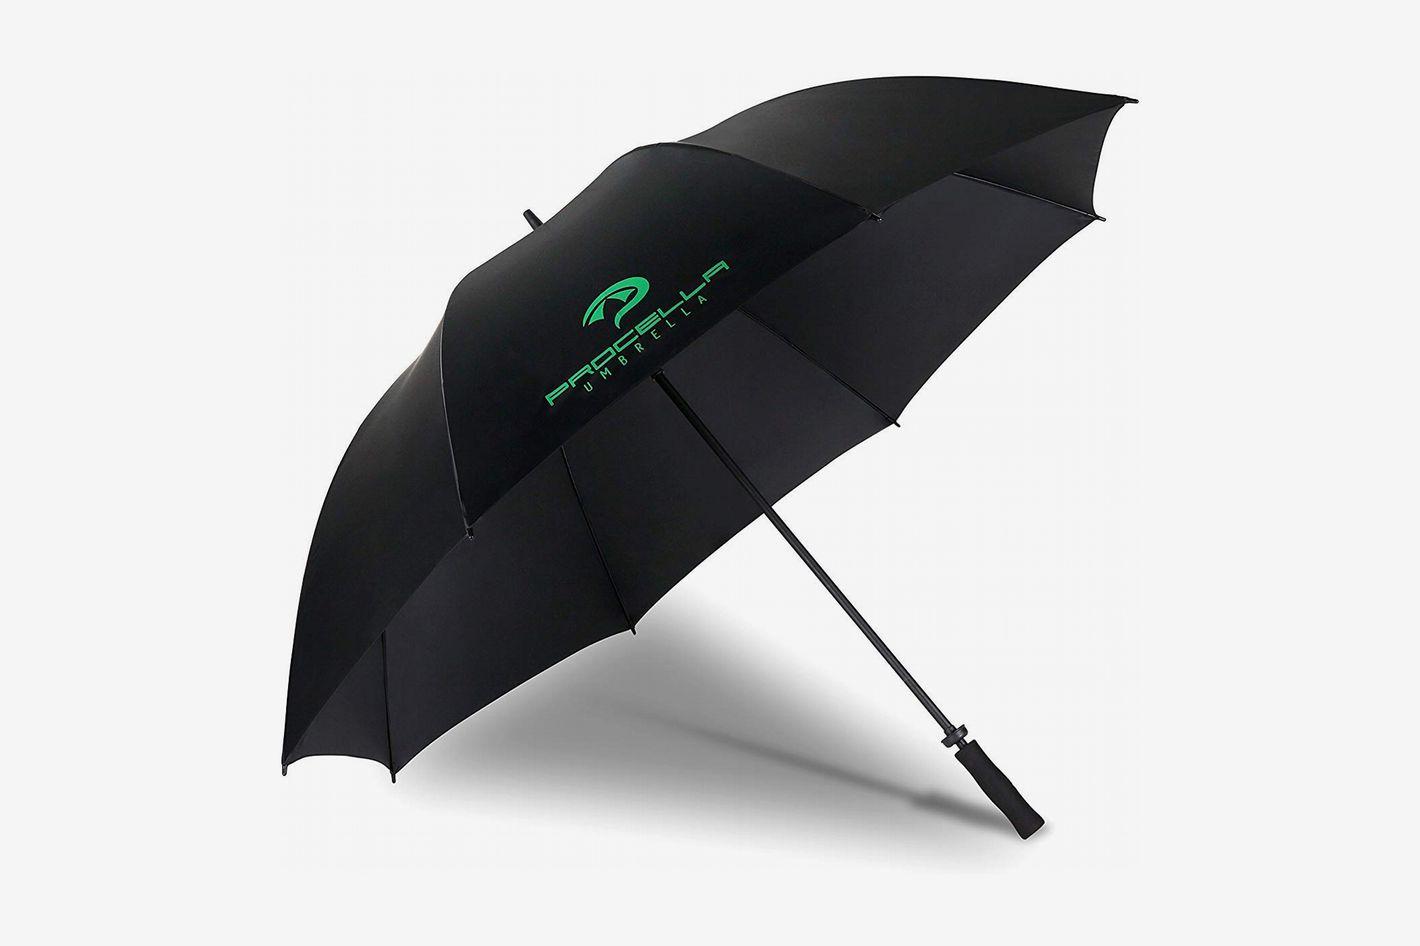 Procella 68-inch Golf Umbrella Windproof Waterproof Extra Large Oversize Stick Single Canopy Umbrella